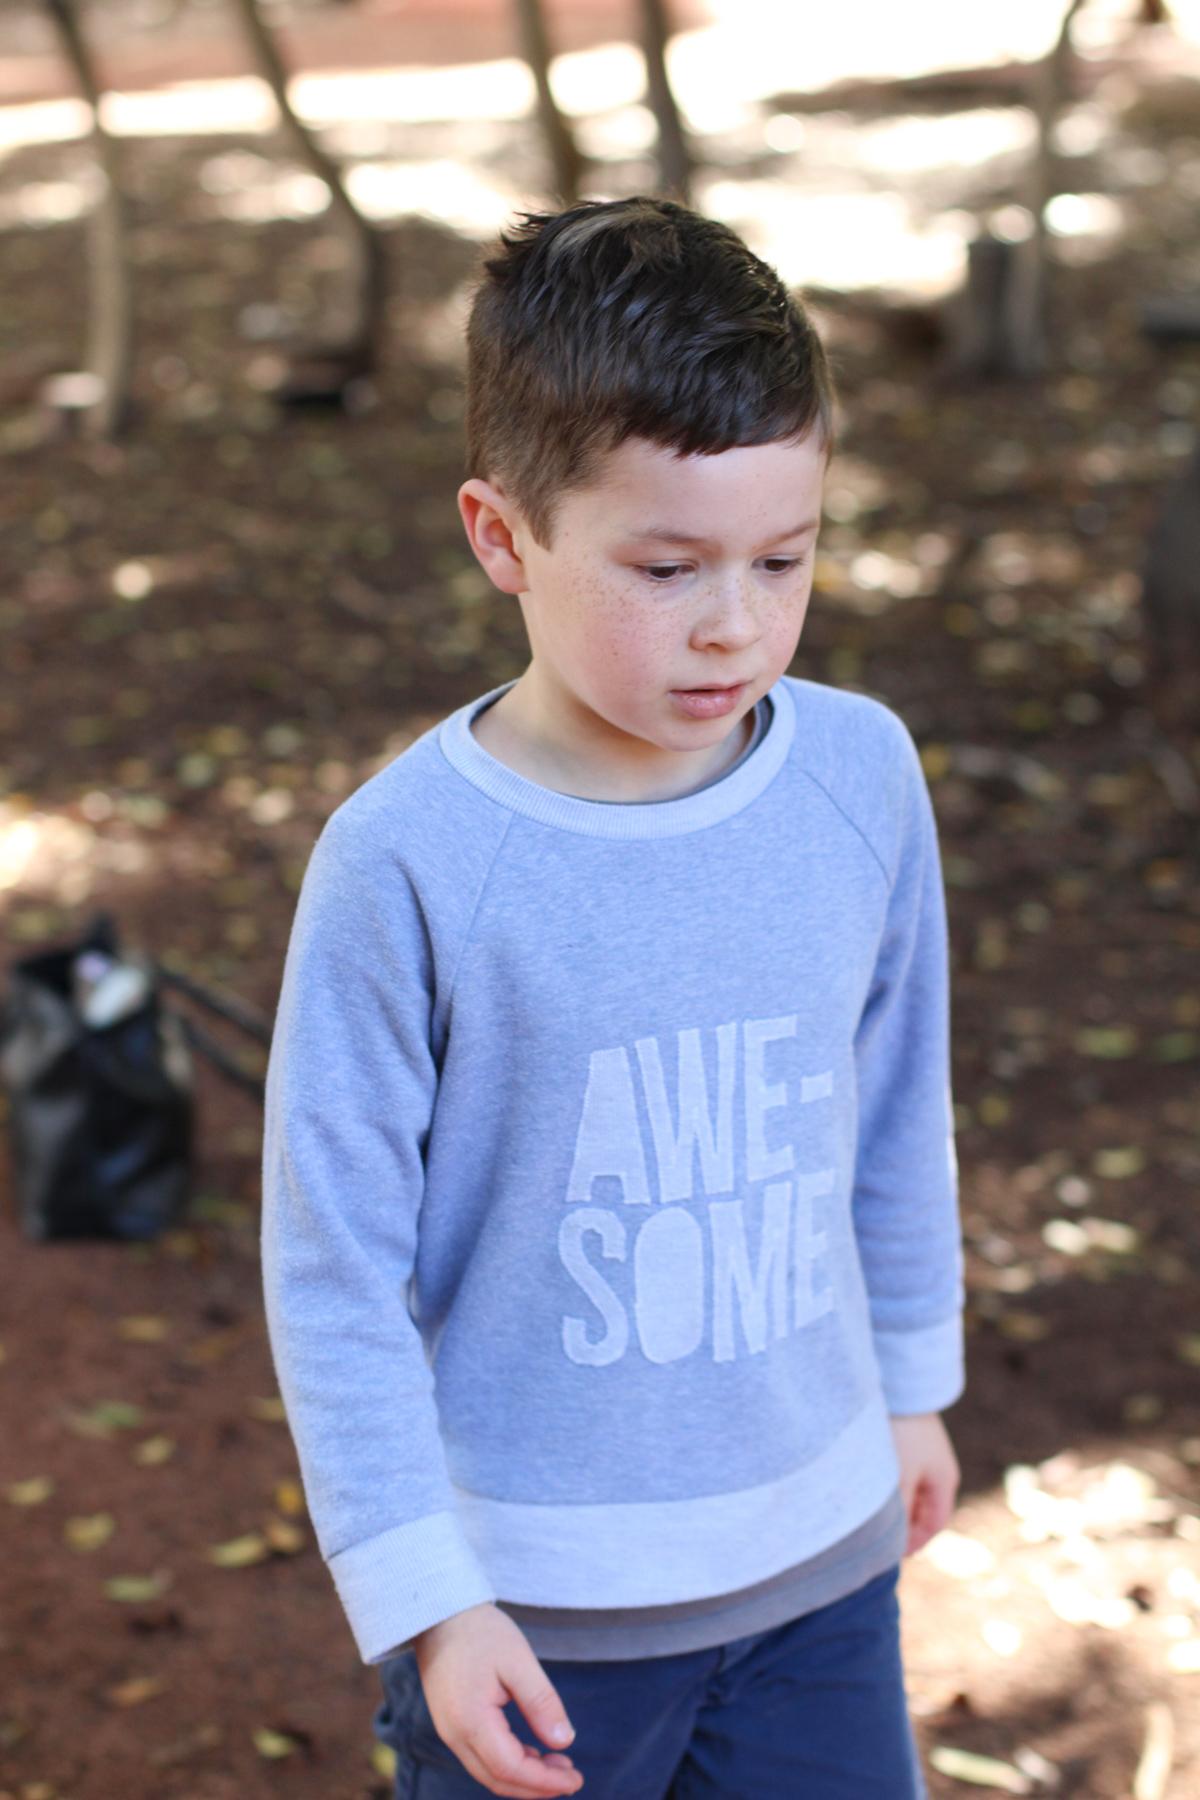 Buddy's awesome sweatshirt using Simplicity 5591